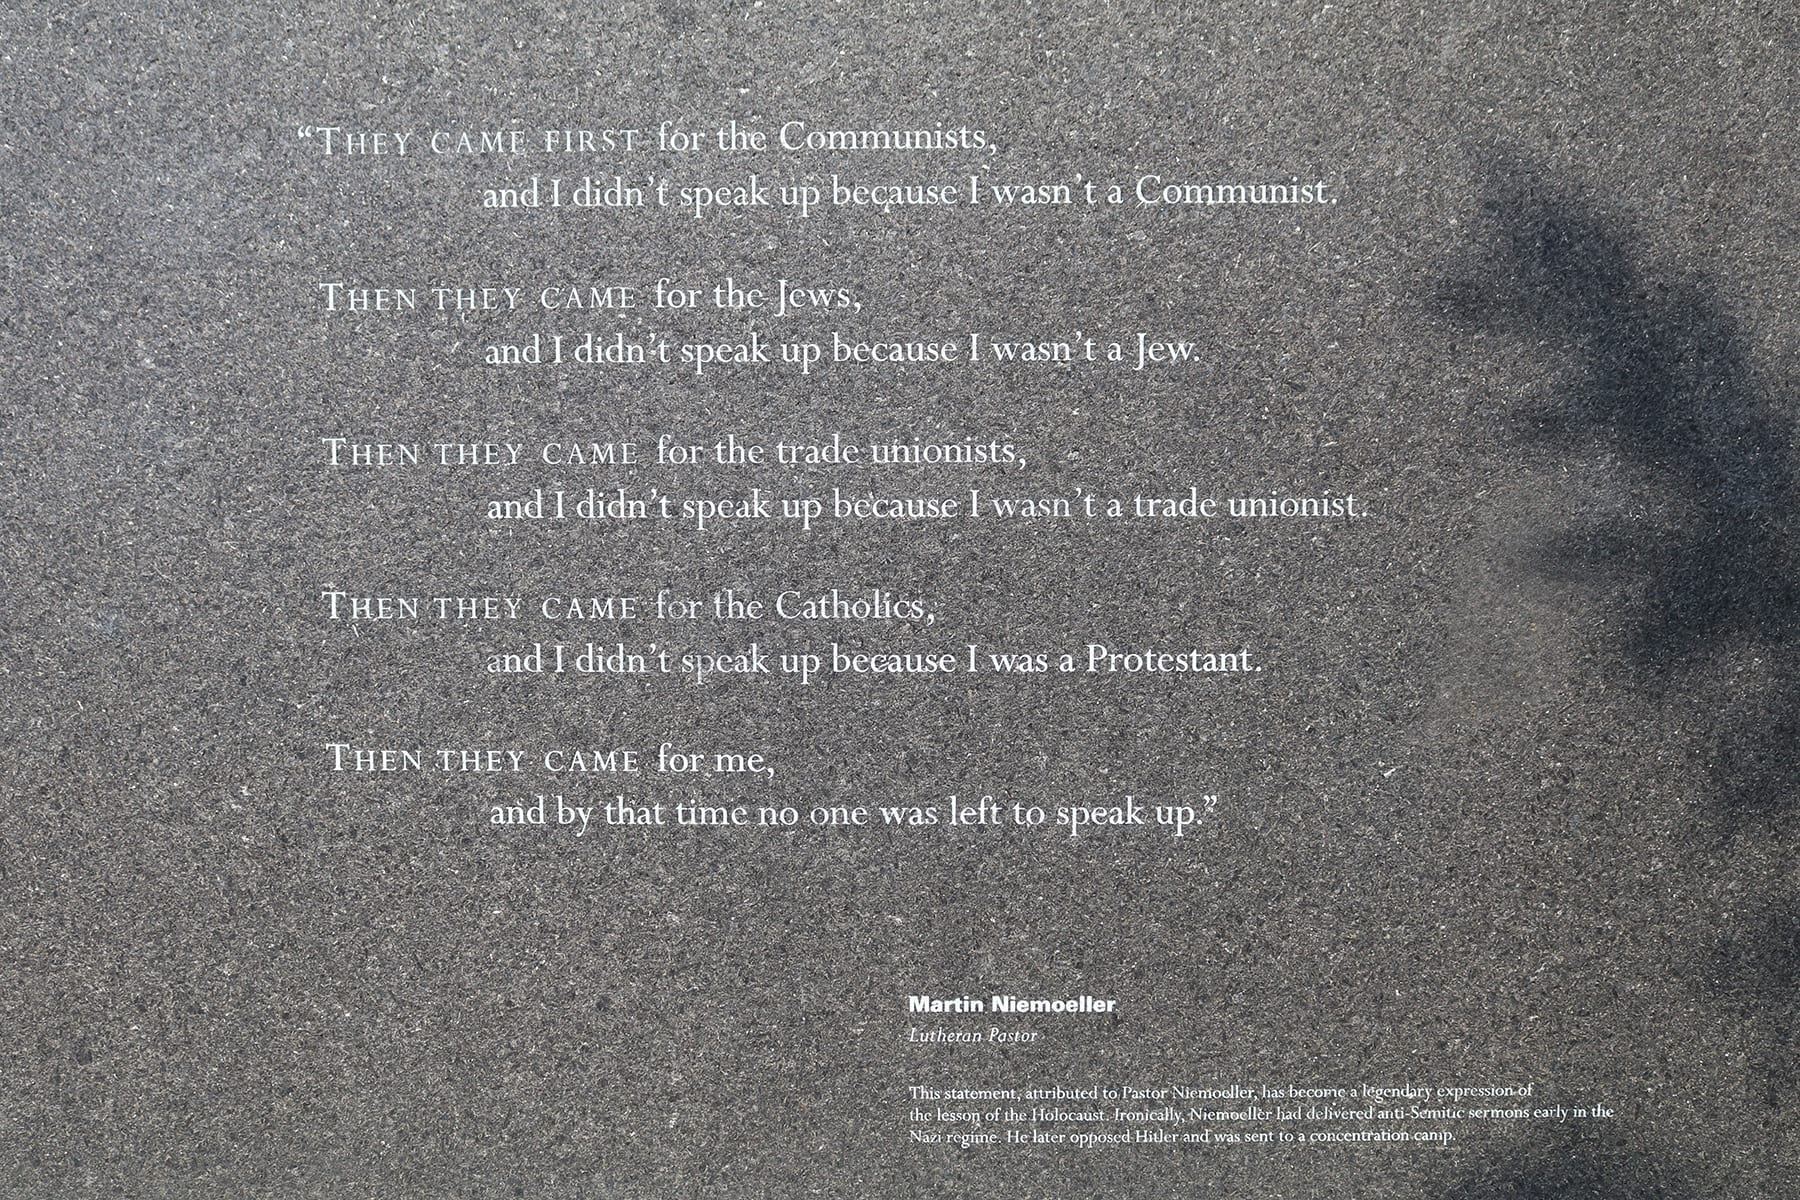 04-MA-journey20-holocaustmemorial03.jpg